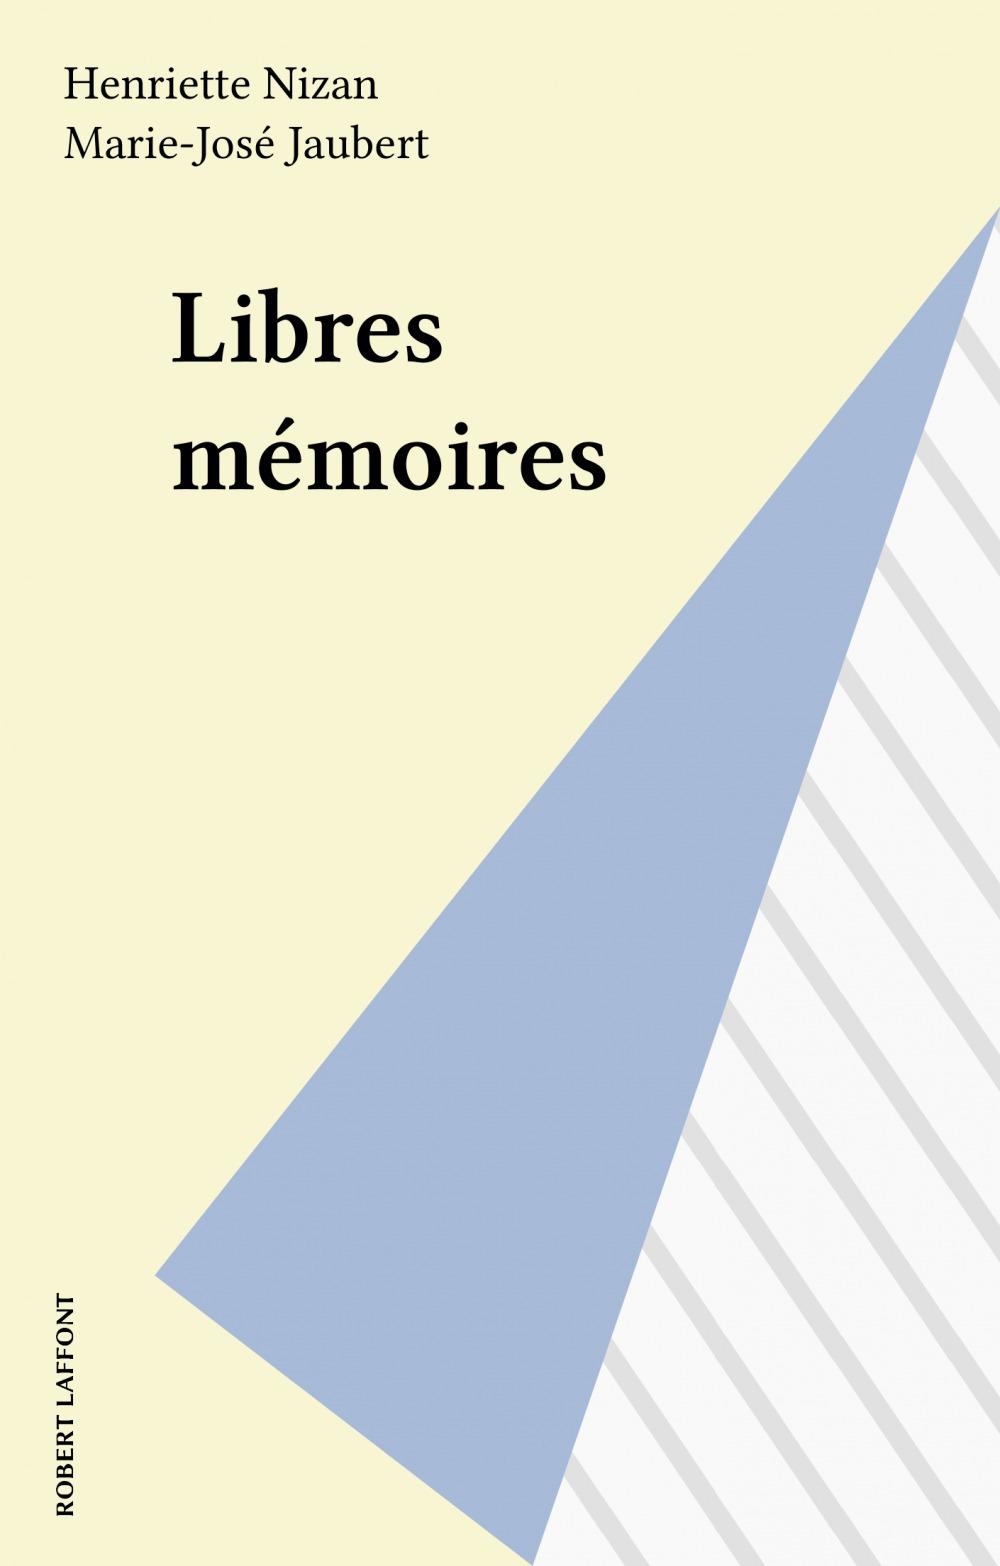 Libres memoires